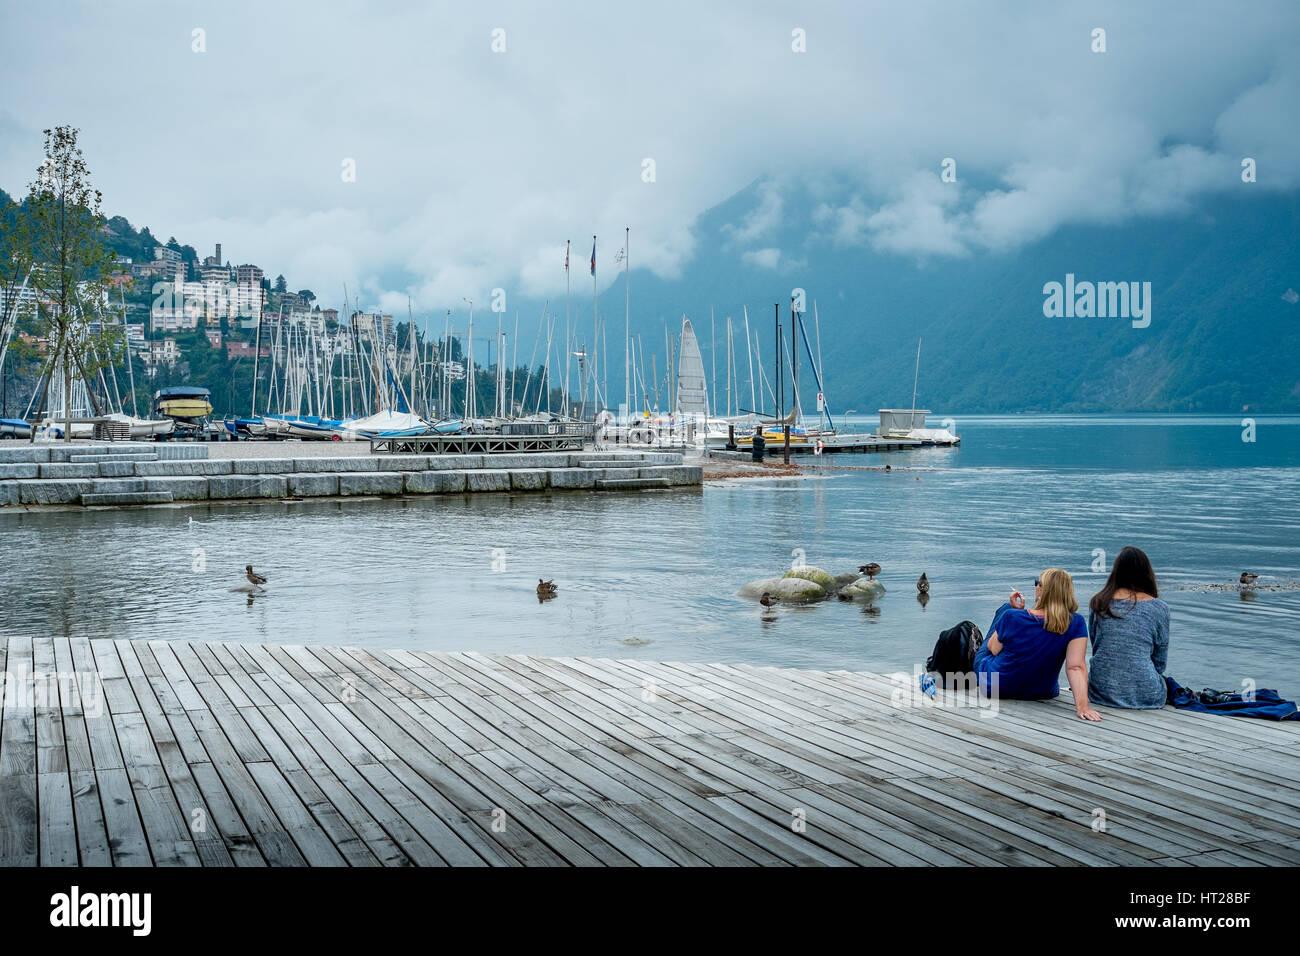 Two girls enjoy the tranquil waters of Lake Lugano, Switzerland. Stock Photo